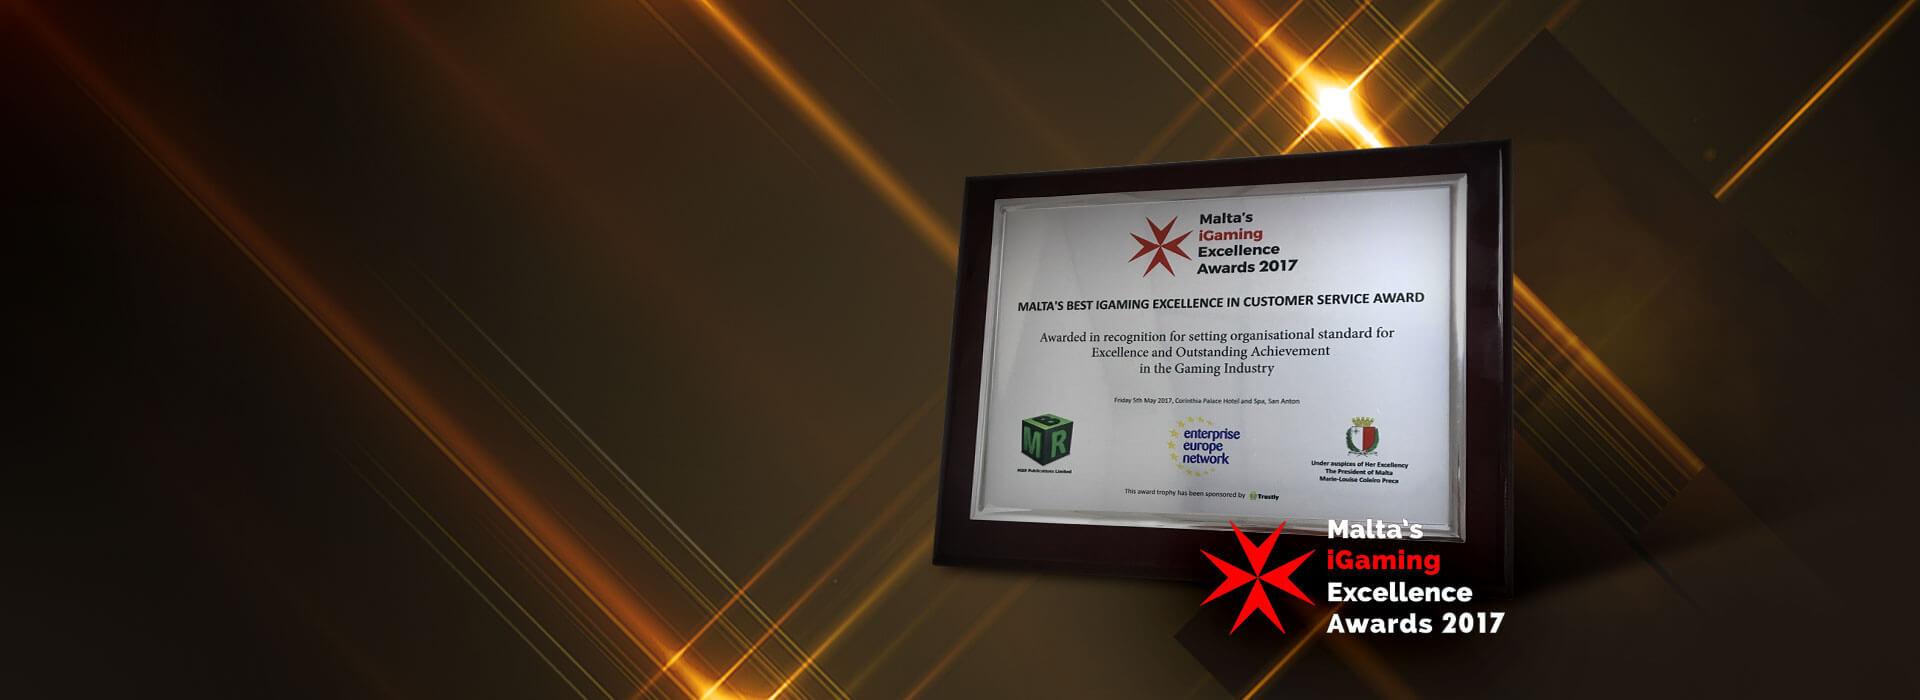 EnergyBet Scoops Another Award